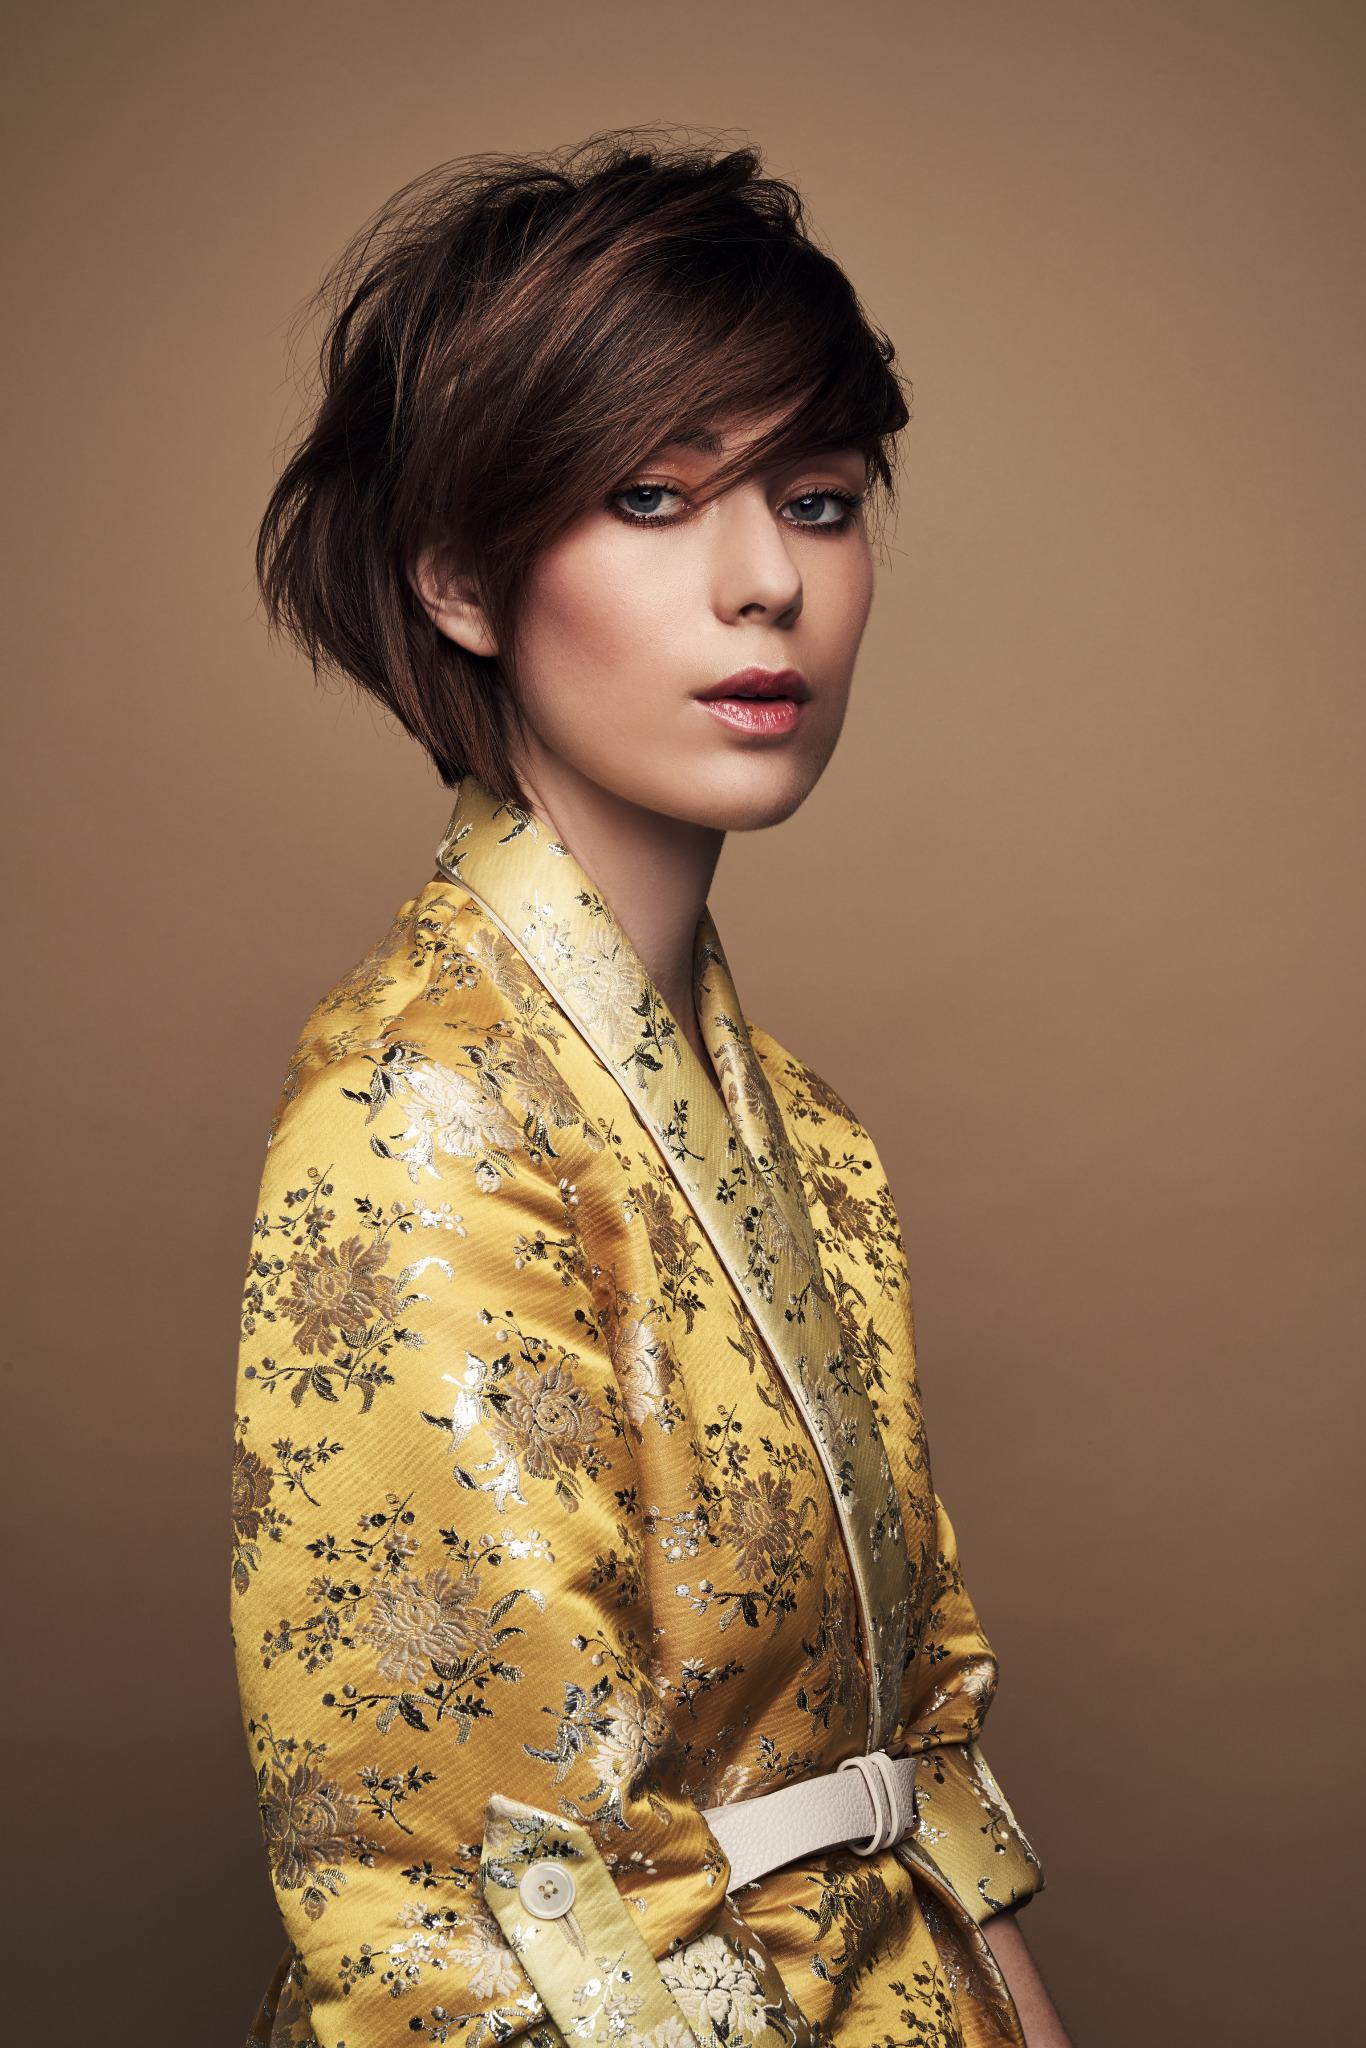 shu-uemura-art-of-hair oscar-oscar-salons oscar-oscar-chadstone jacky-chan-chadstone